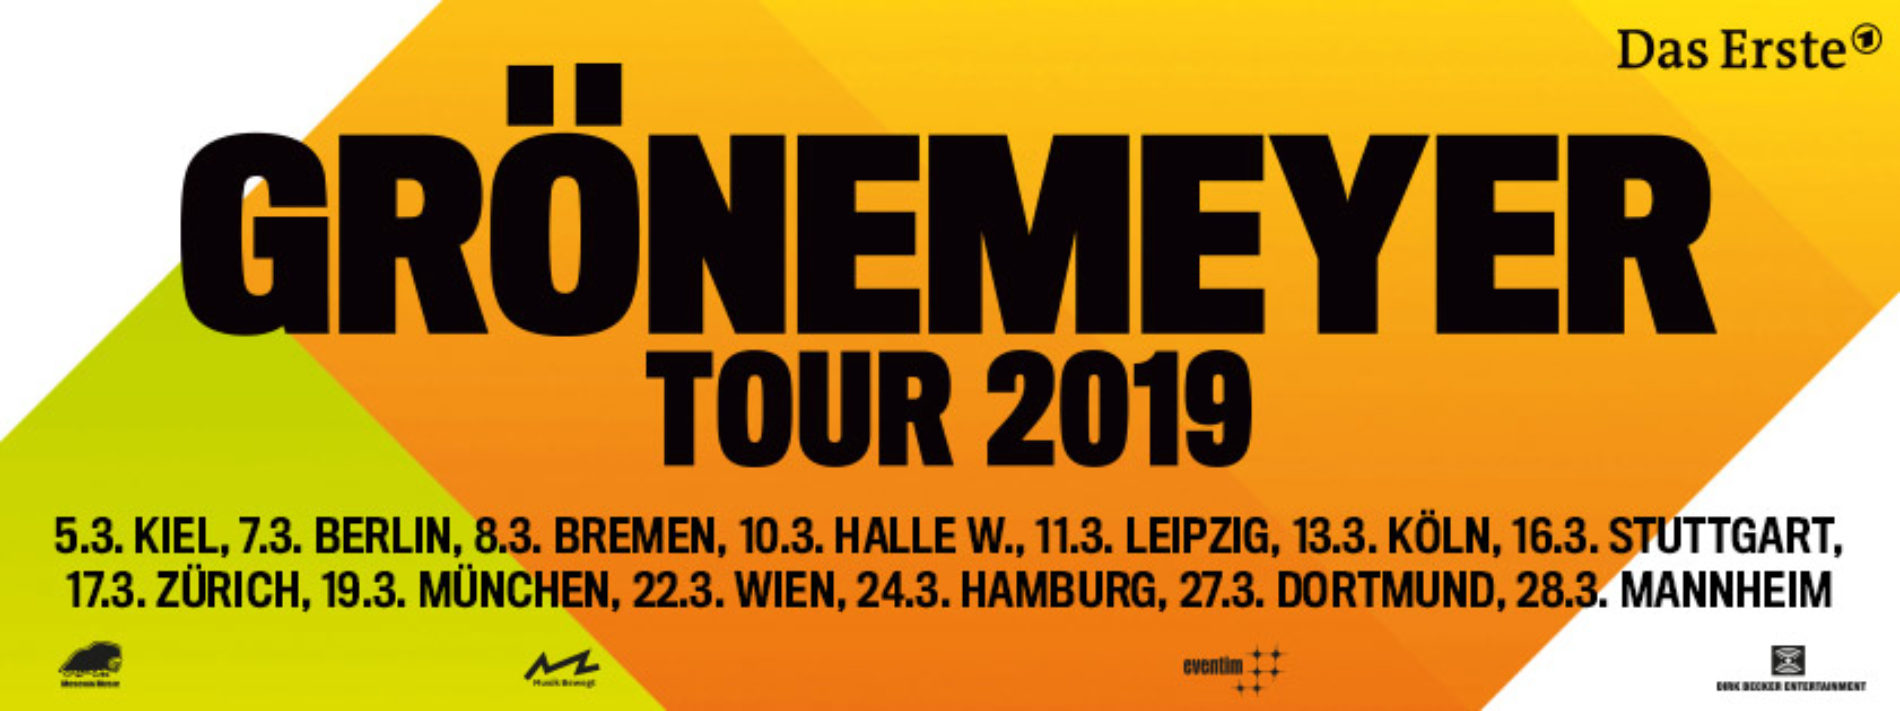 Grönemeyer Arena Tour 2019